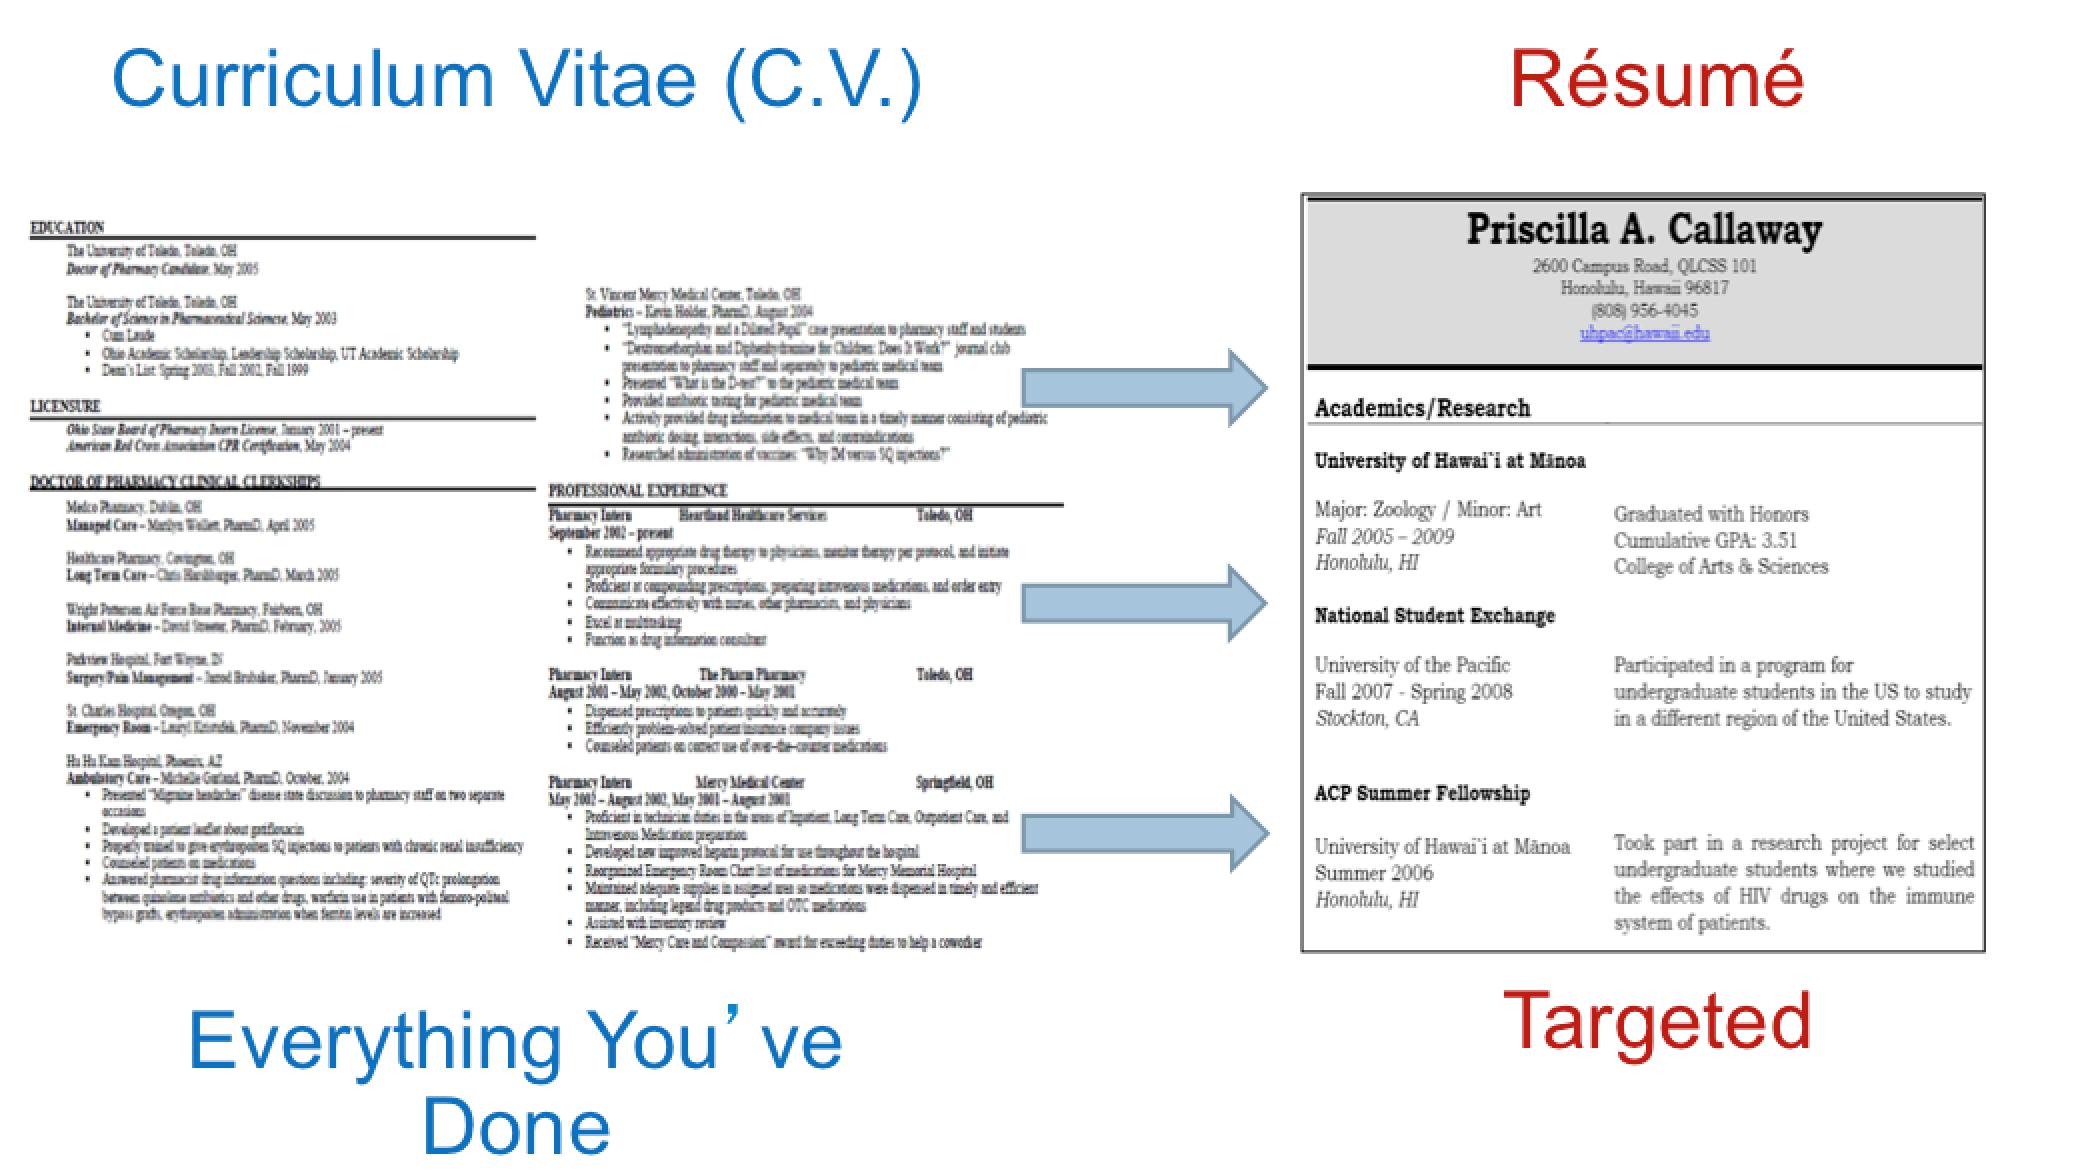 Curriculum Vitae Vs Resume Curriculum Vitae Vs Resume Will Be A Thing Of The Past And Here Curriculum Vitae Curriculum Vitae Examples Curriculum Vitae Resume